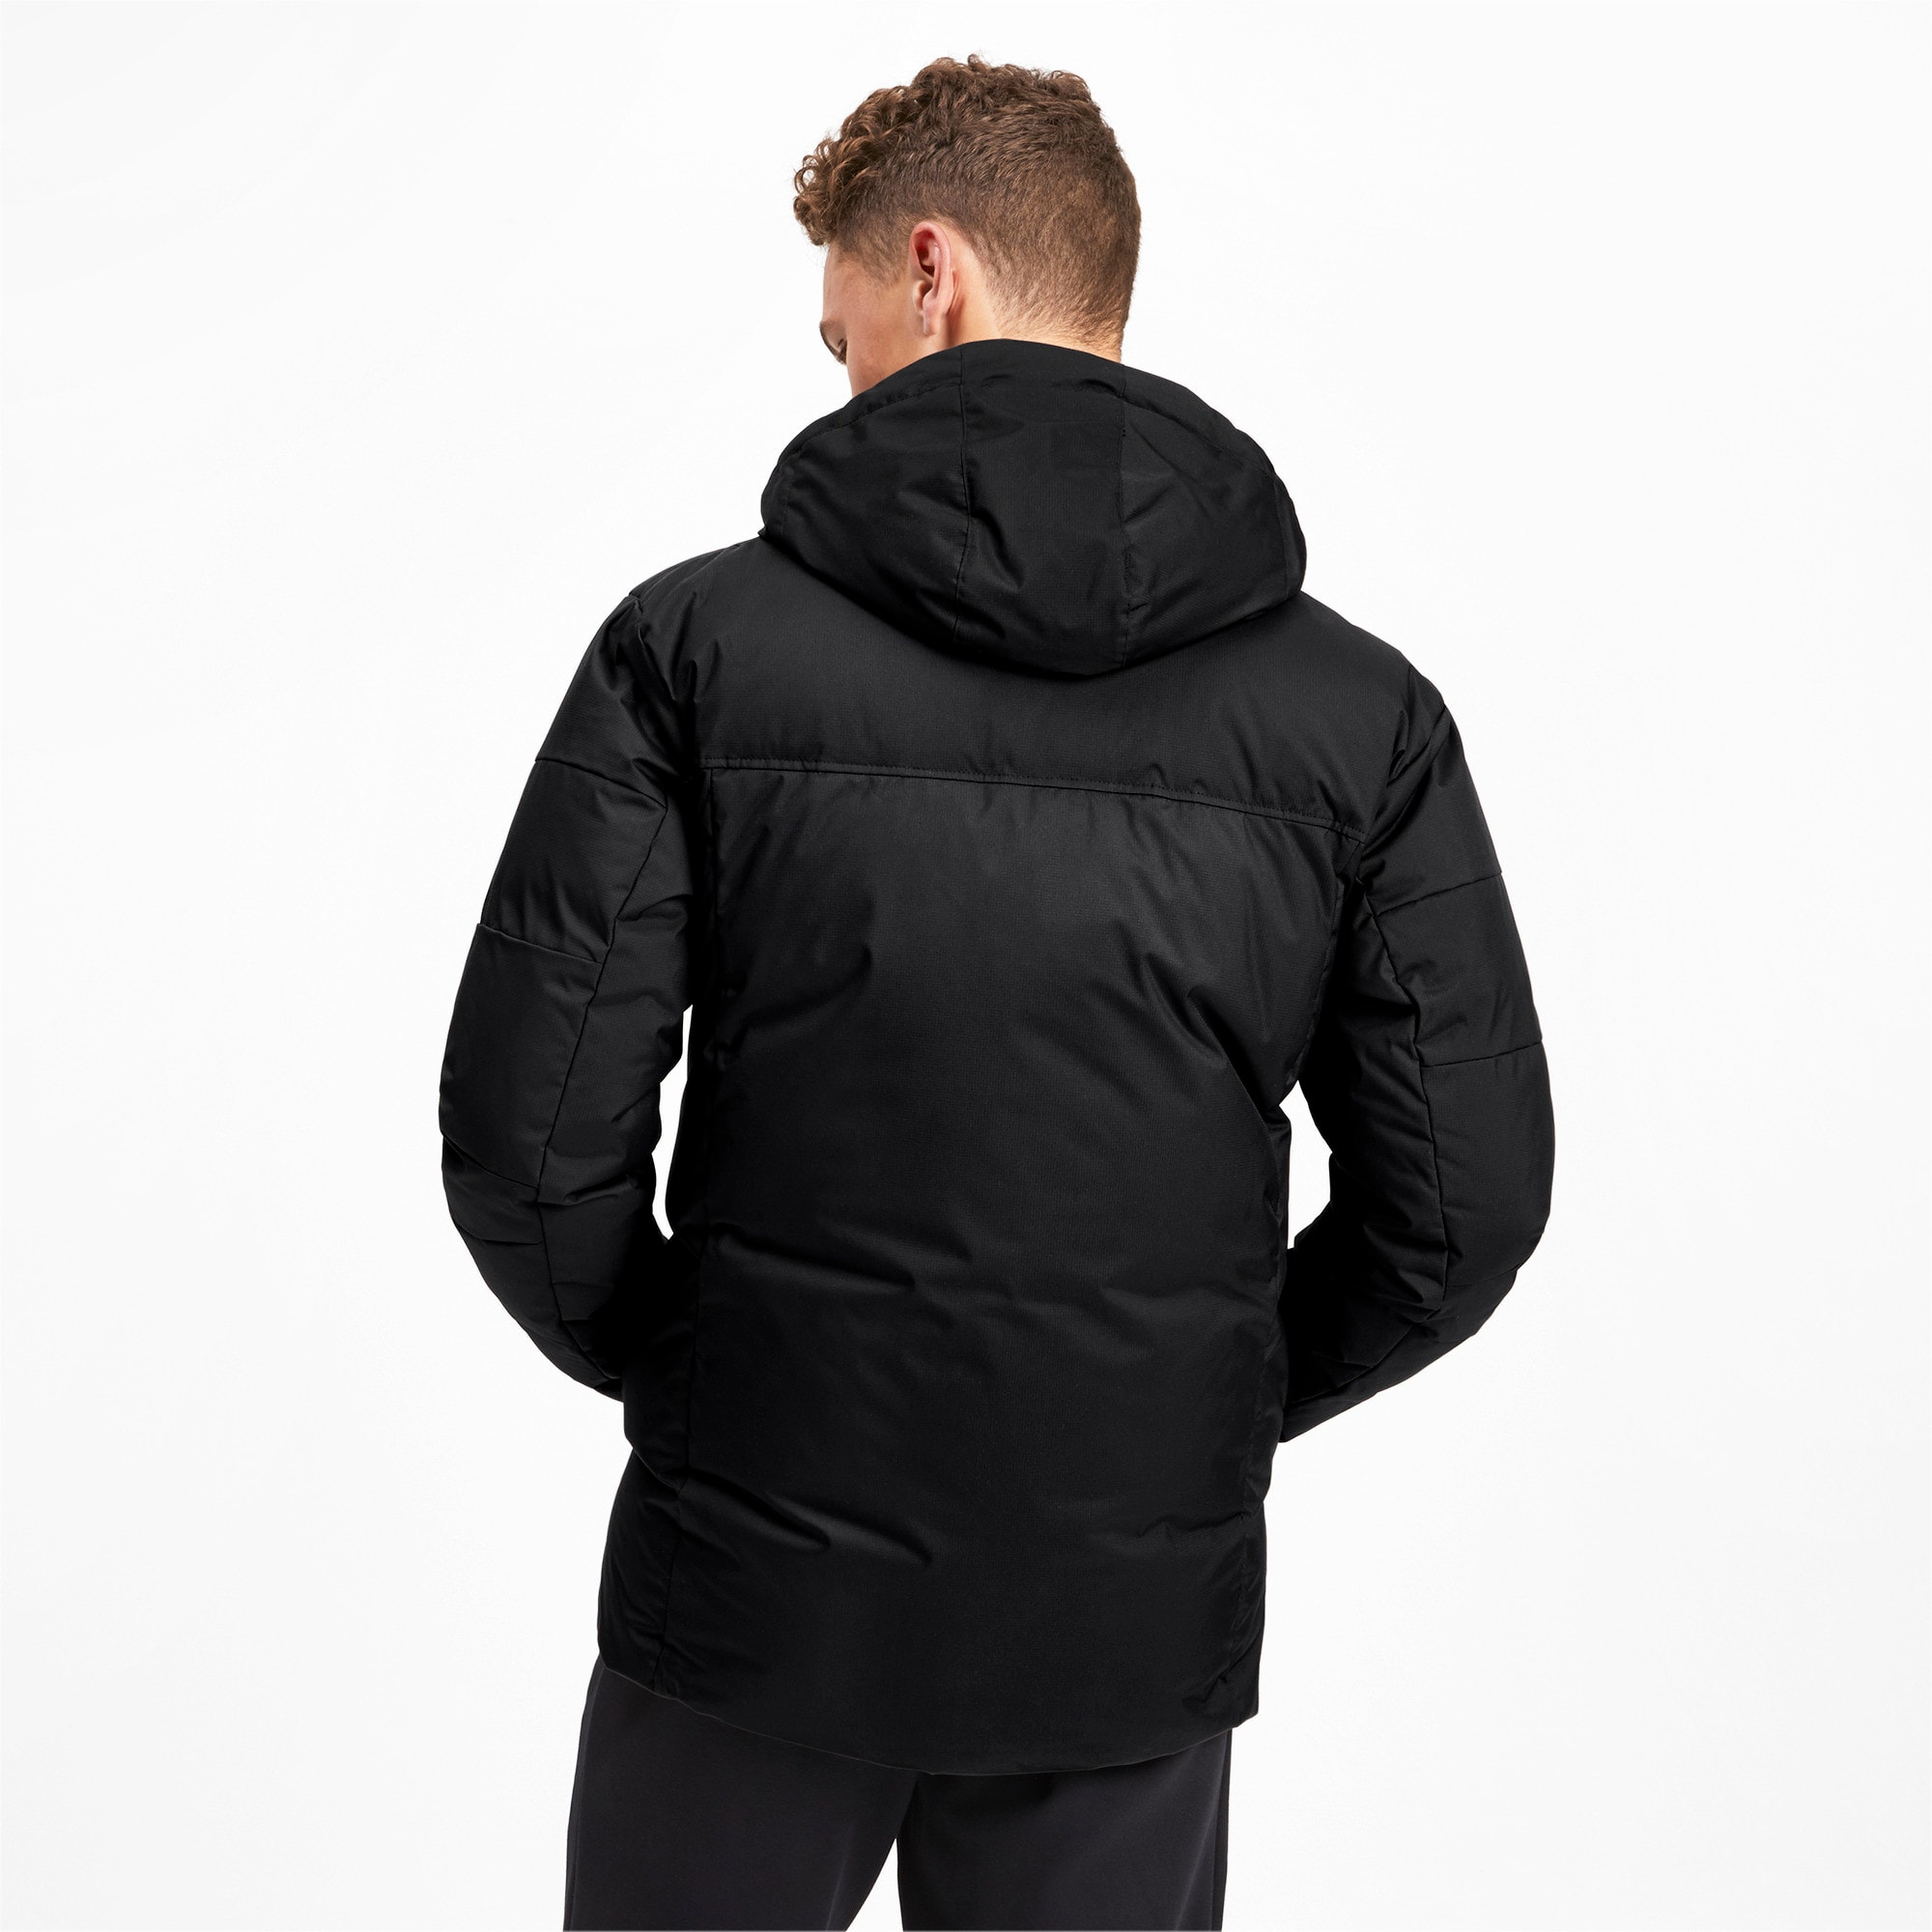 Thumbnail 2 of 650 Protective Down Men's Jacket, Puma Black, medium